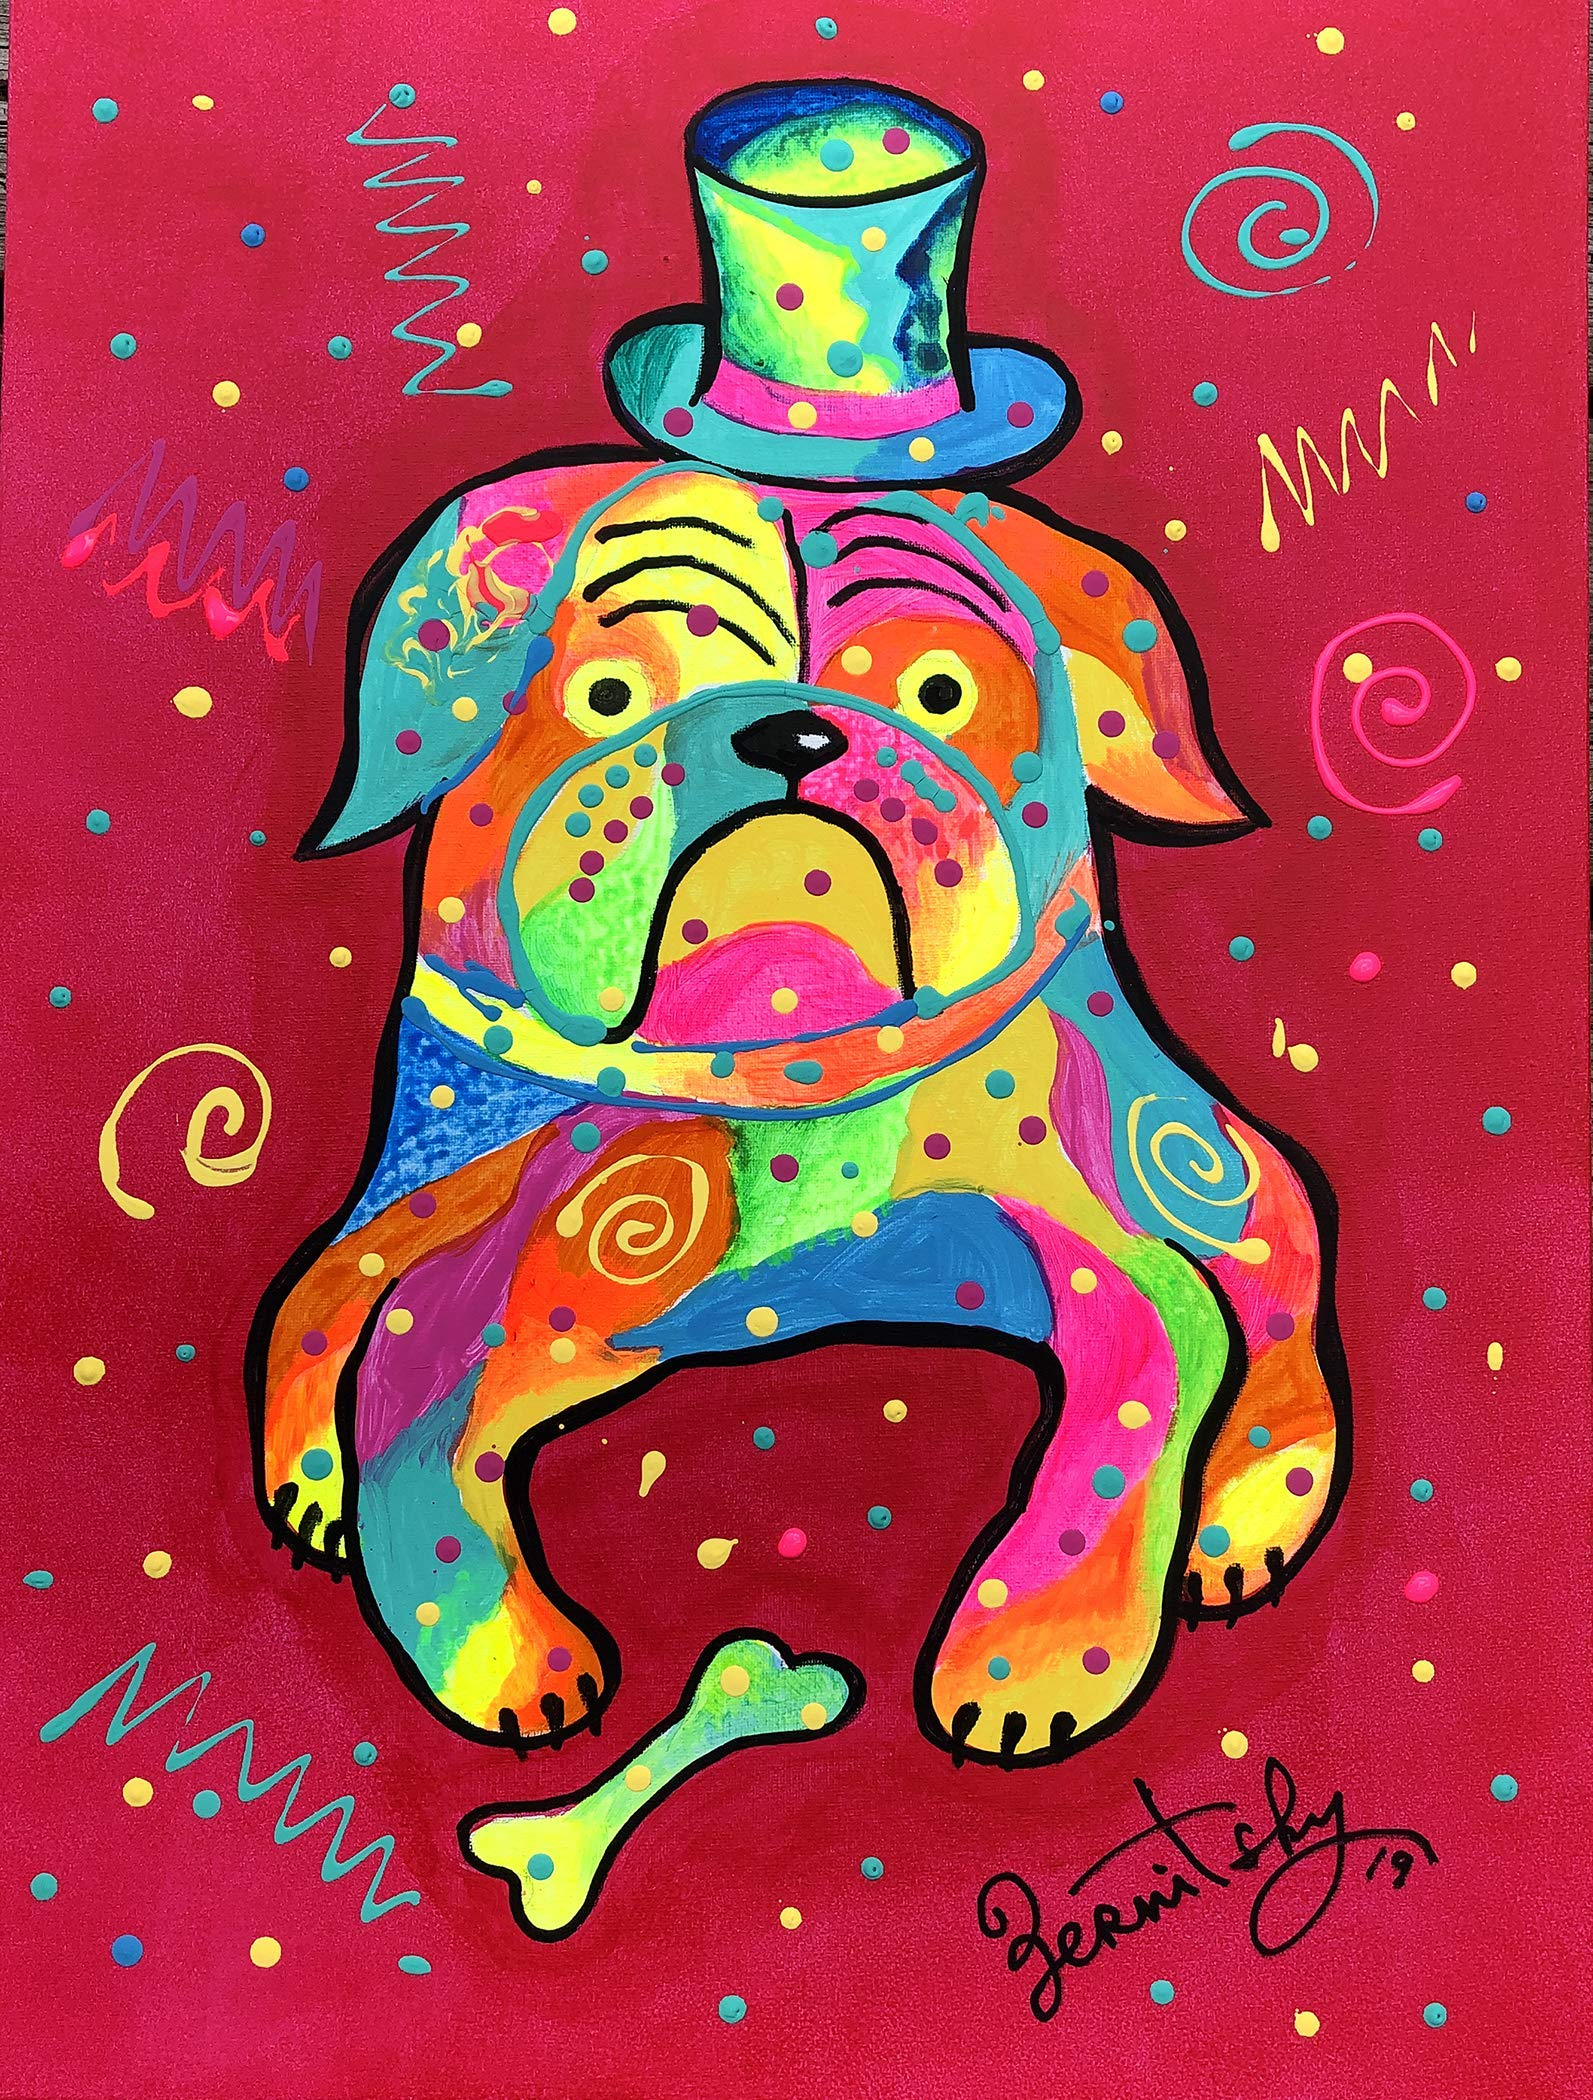 Bulldog - My Sweet Heart by